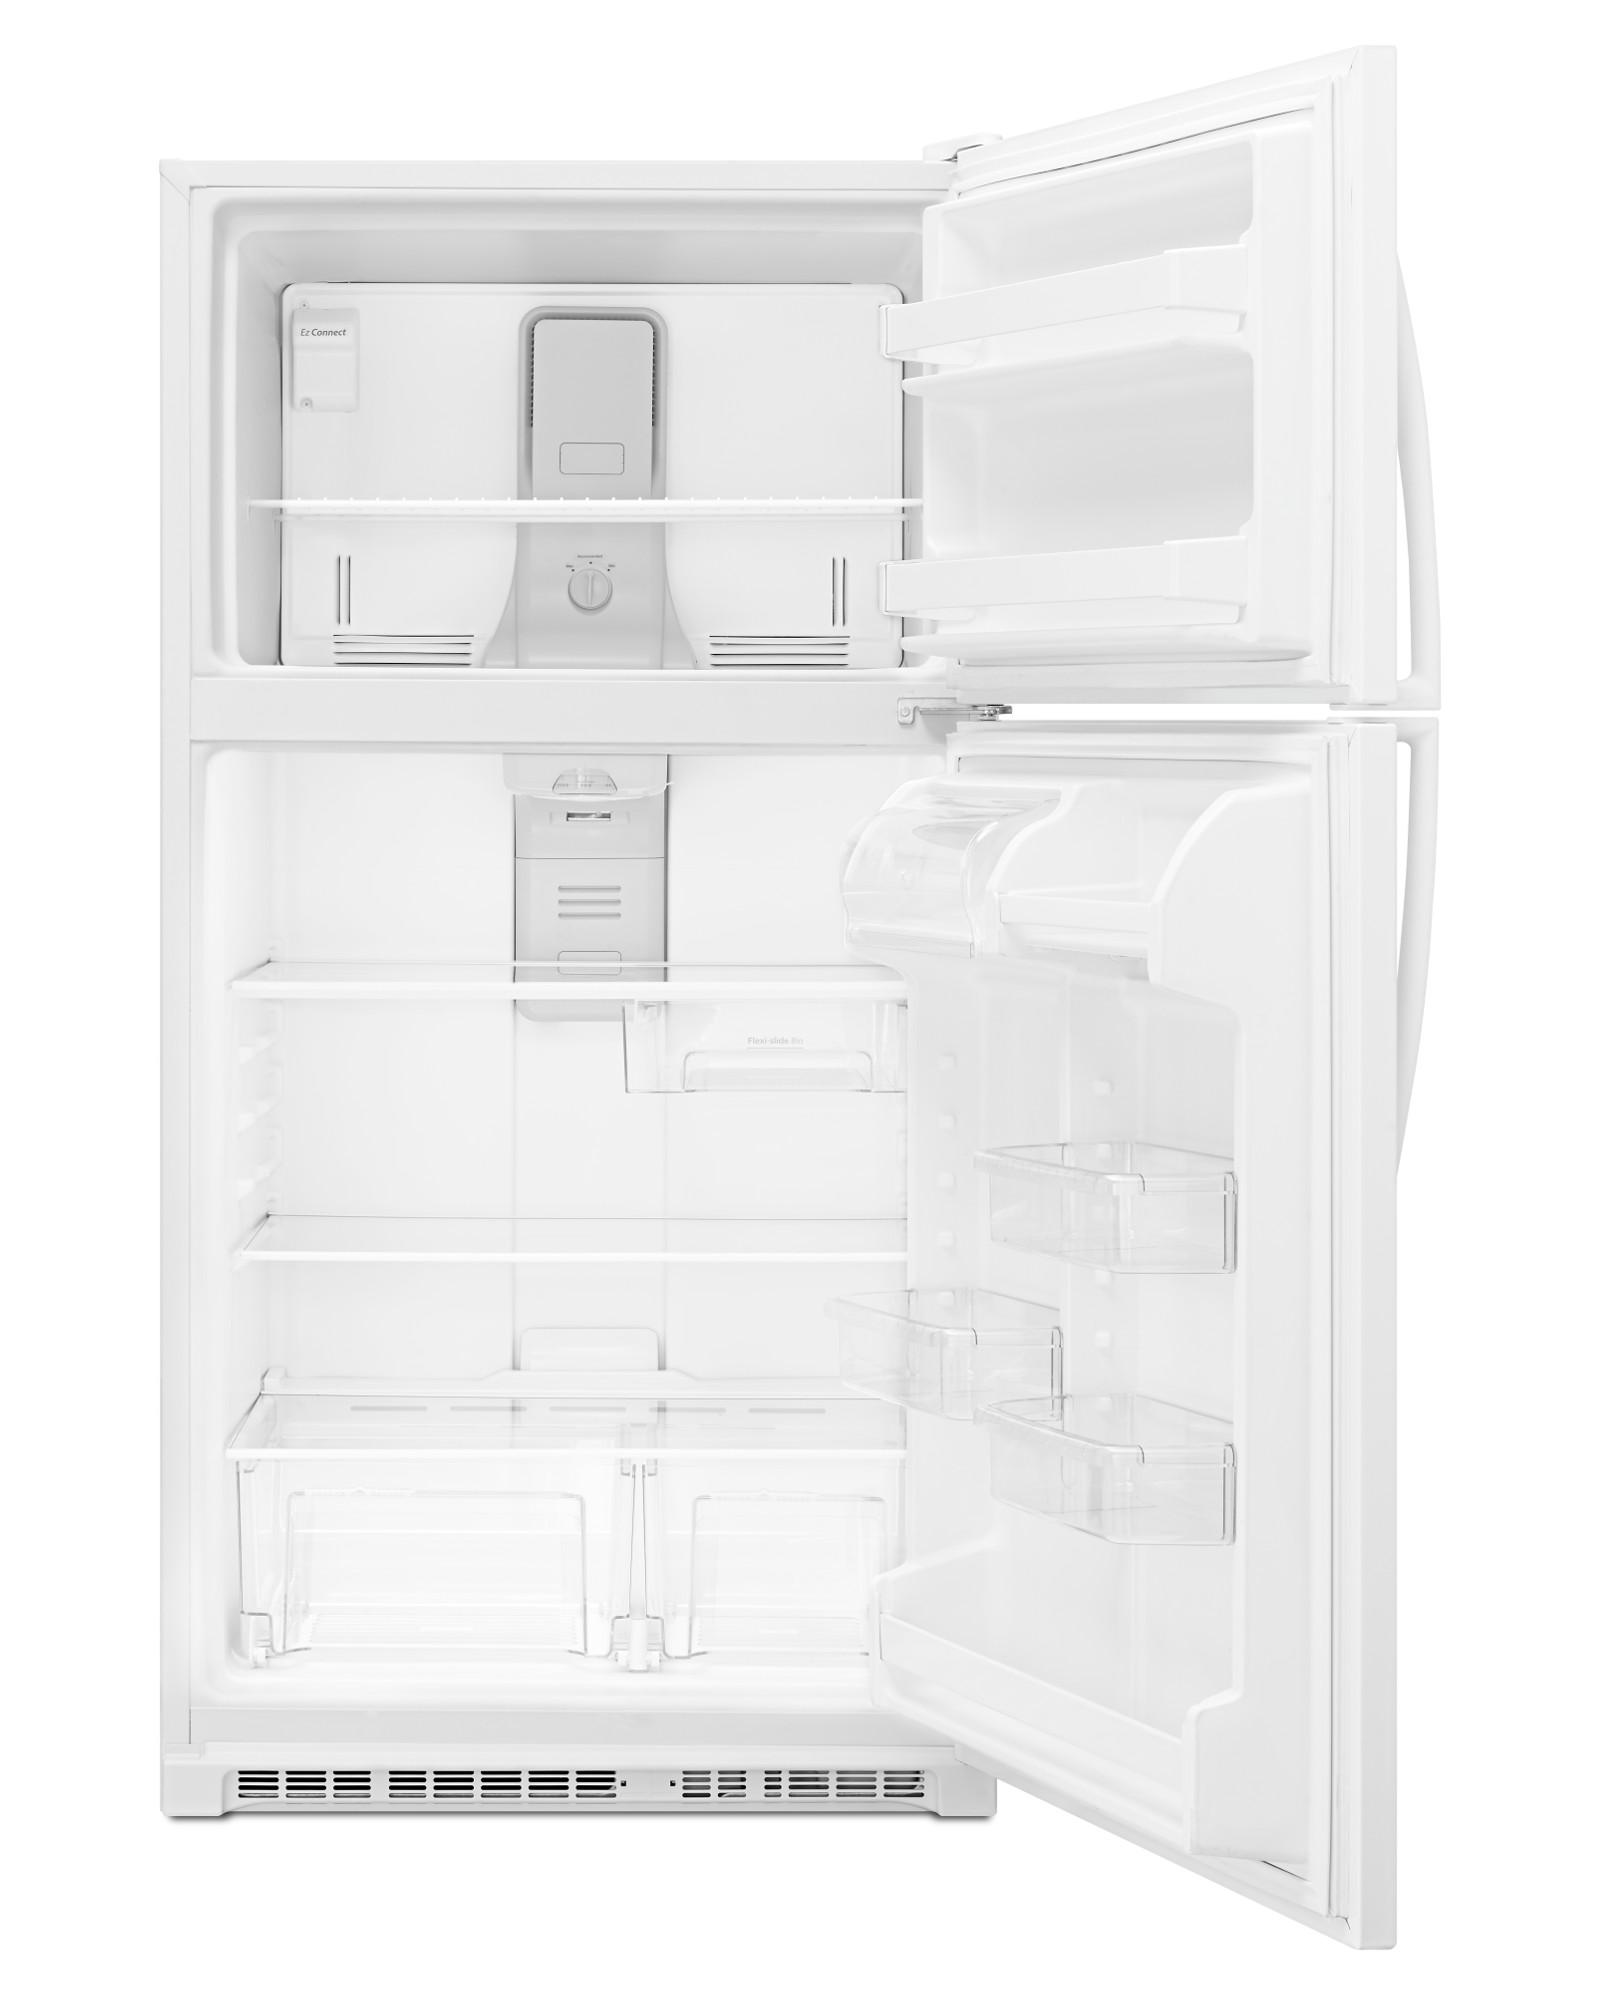 Whirlpool 20.5 cu. ft. Top Freezer Refrigerator - White